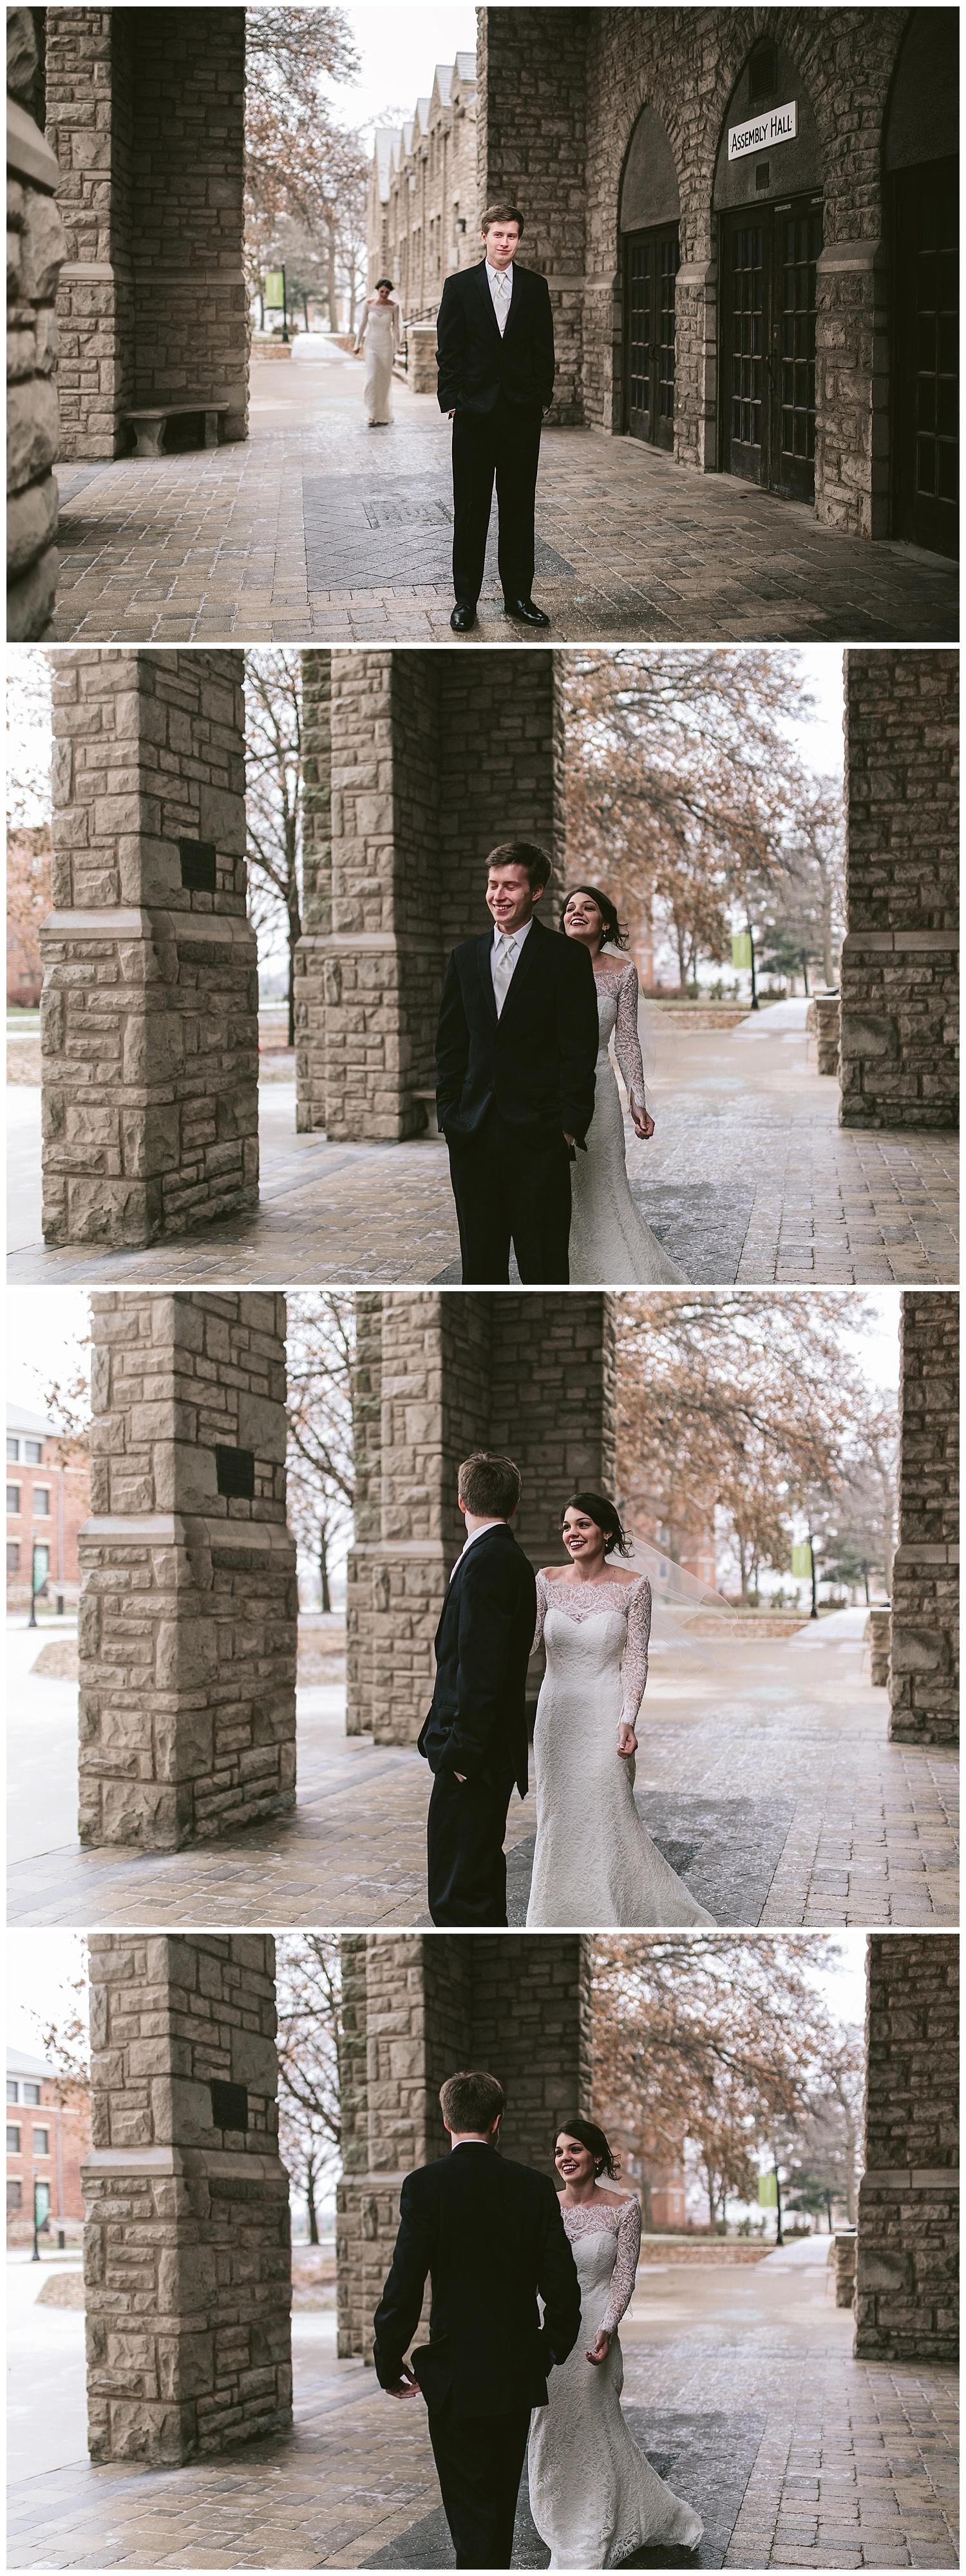 Central Mo winter wedding photography_0012.jpg